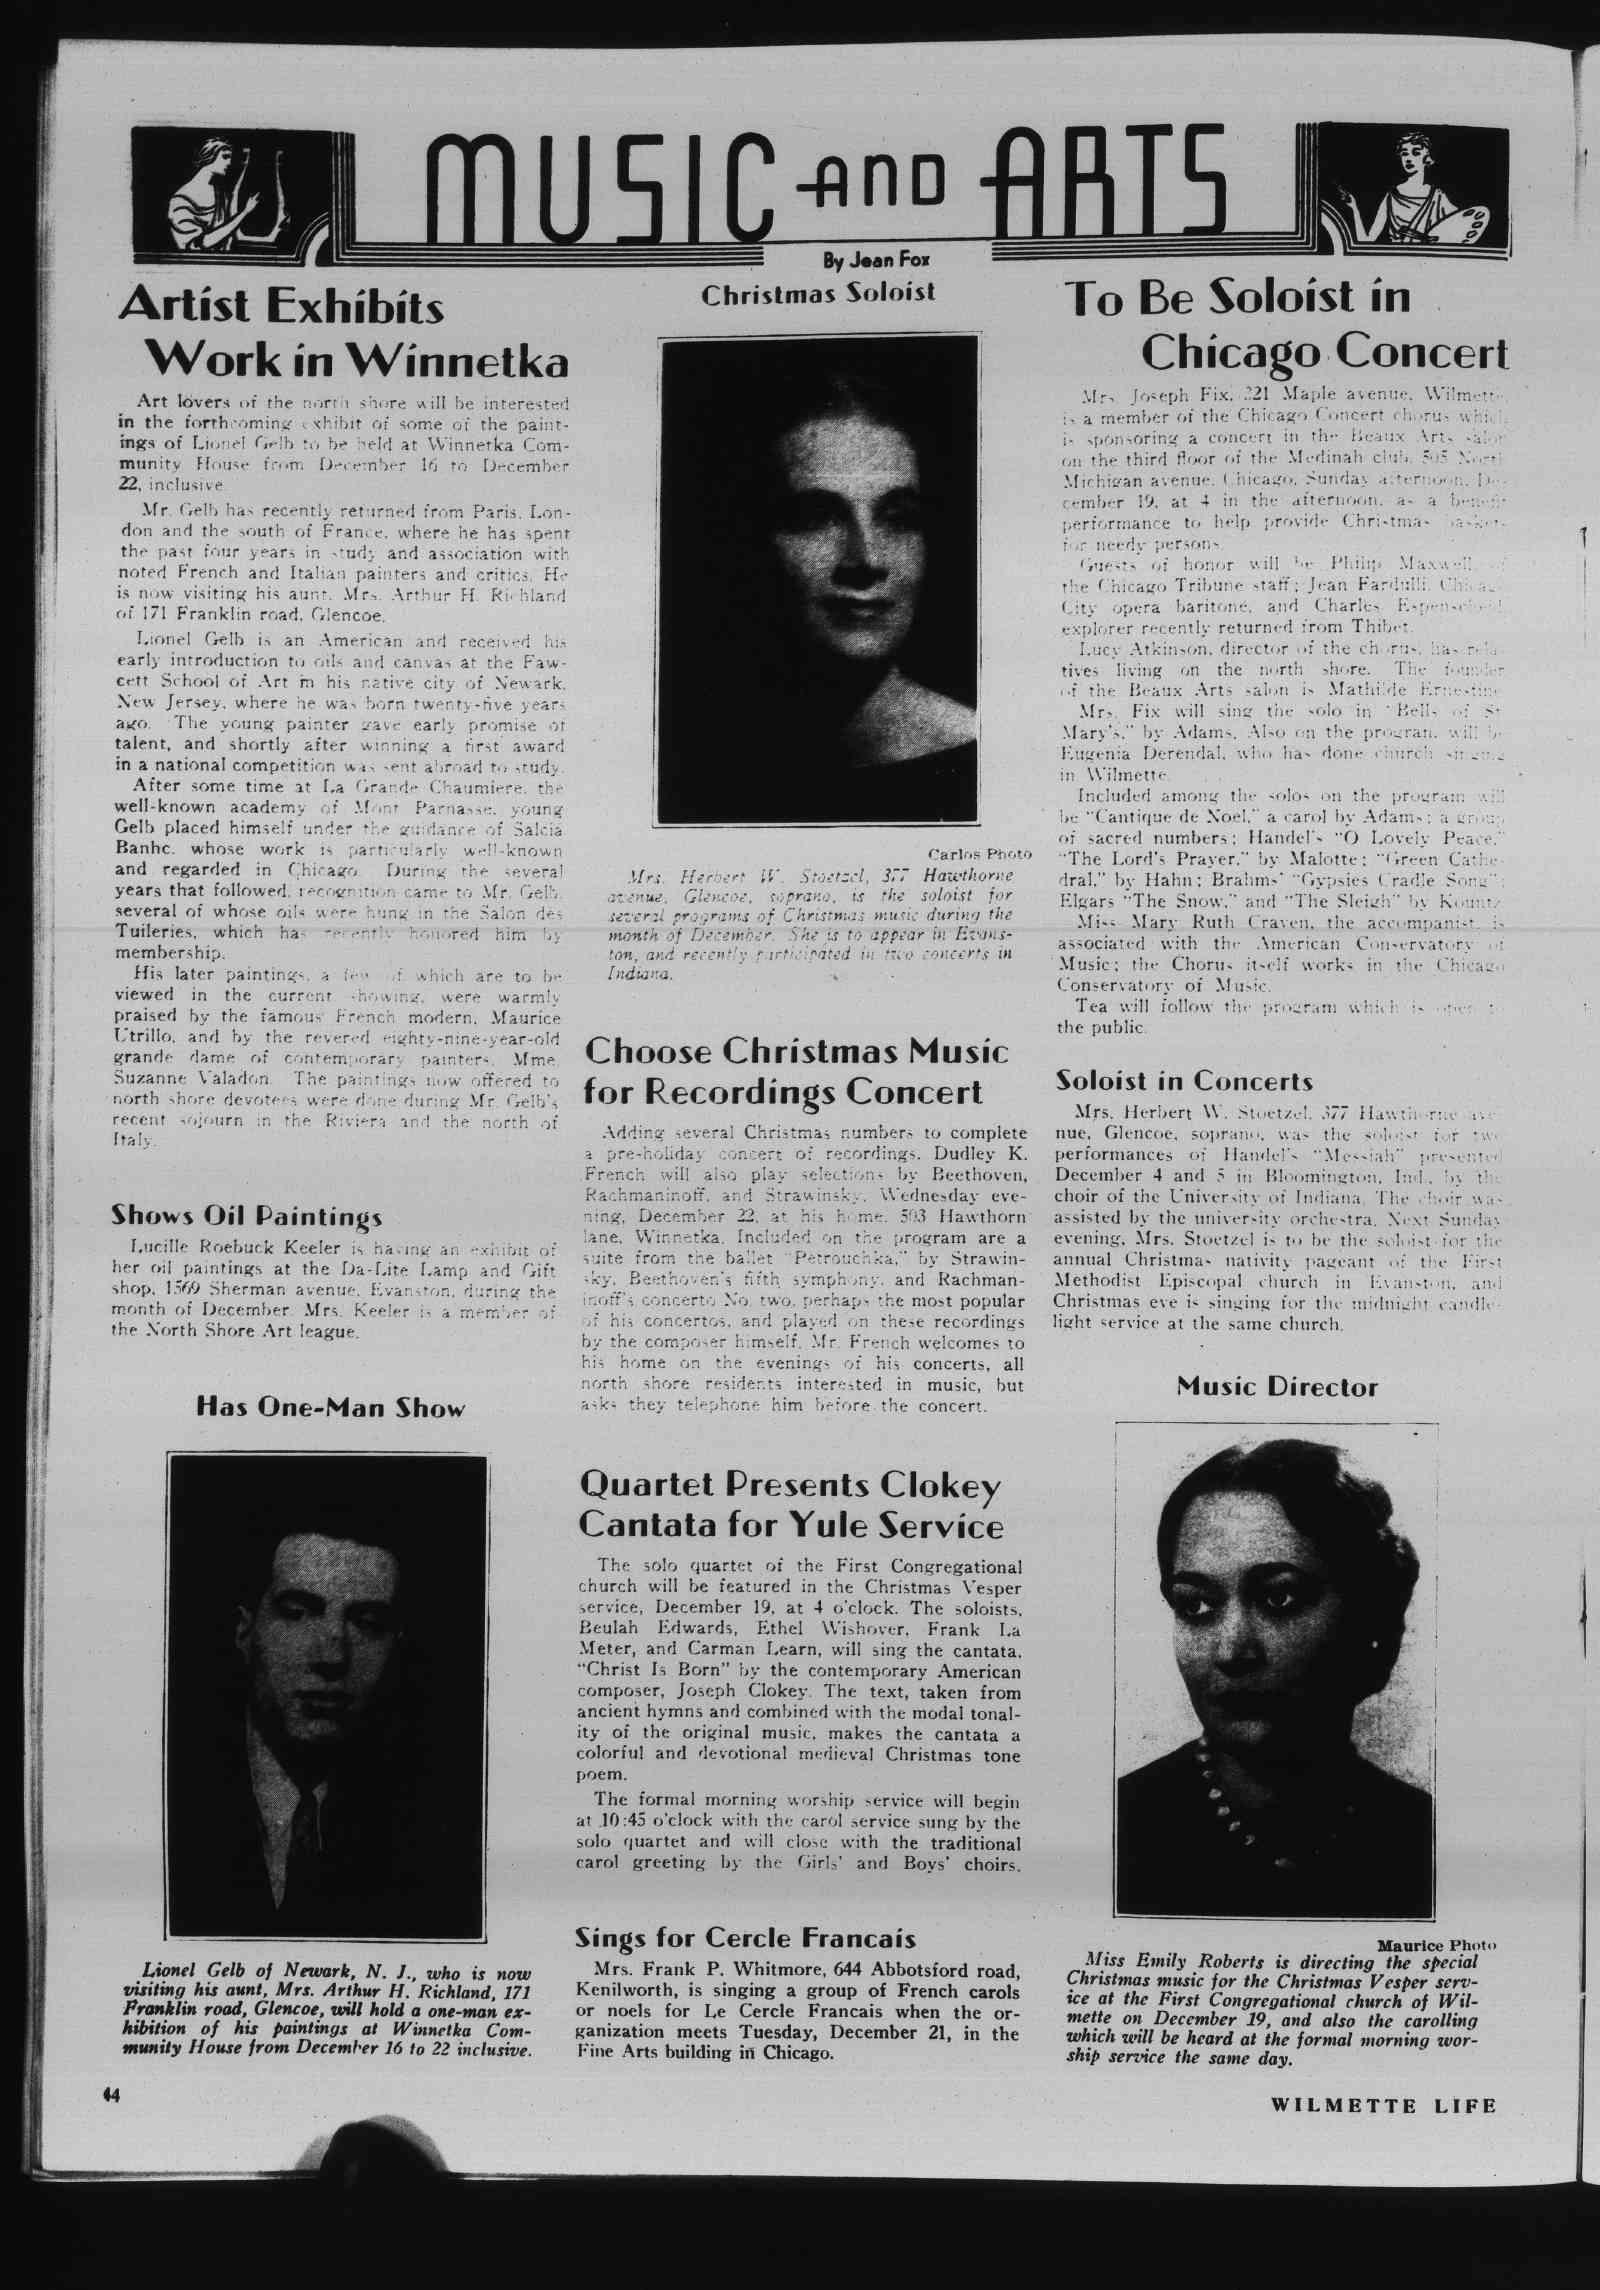 Wilmette Life (Wilmette, Illinois), 16 Dec 1937